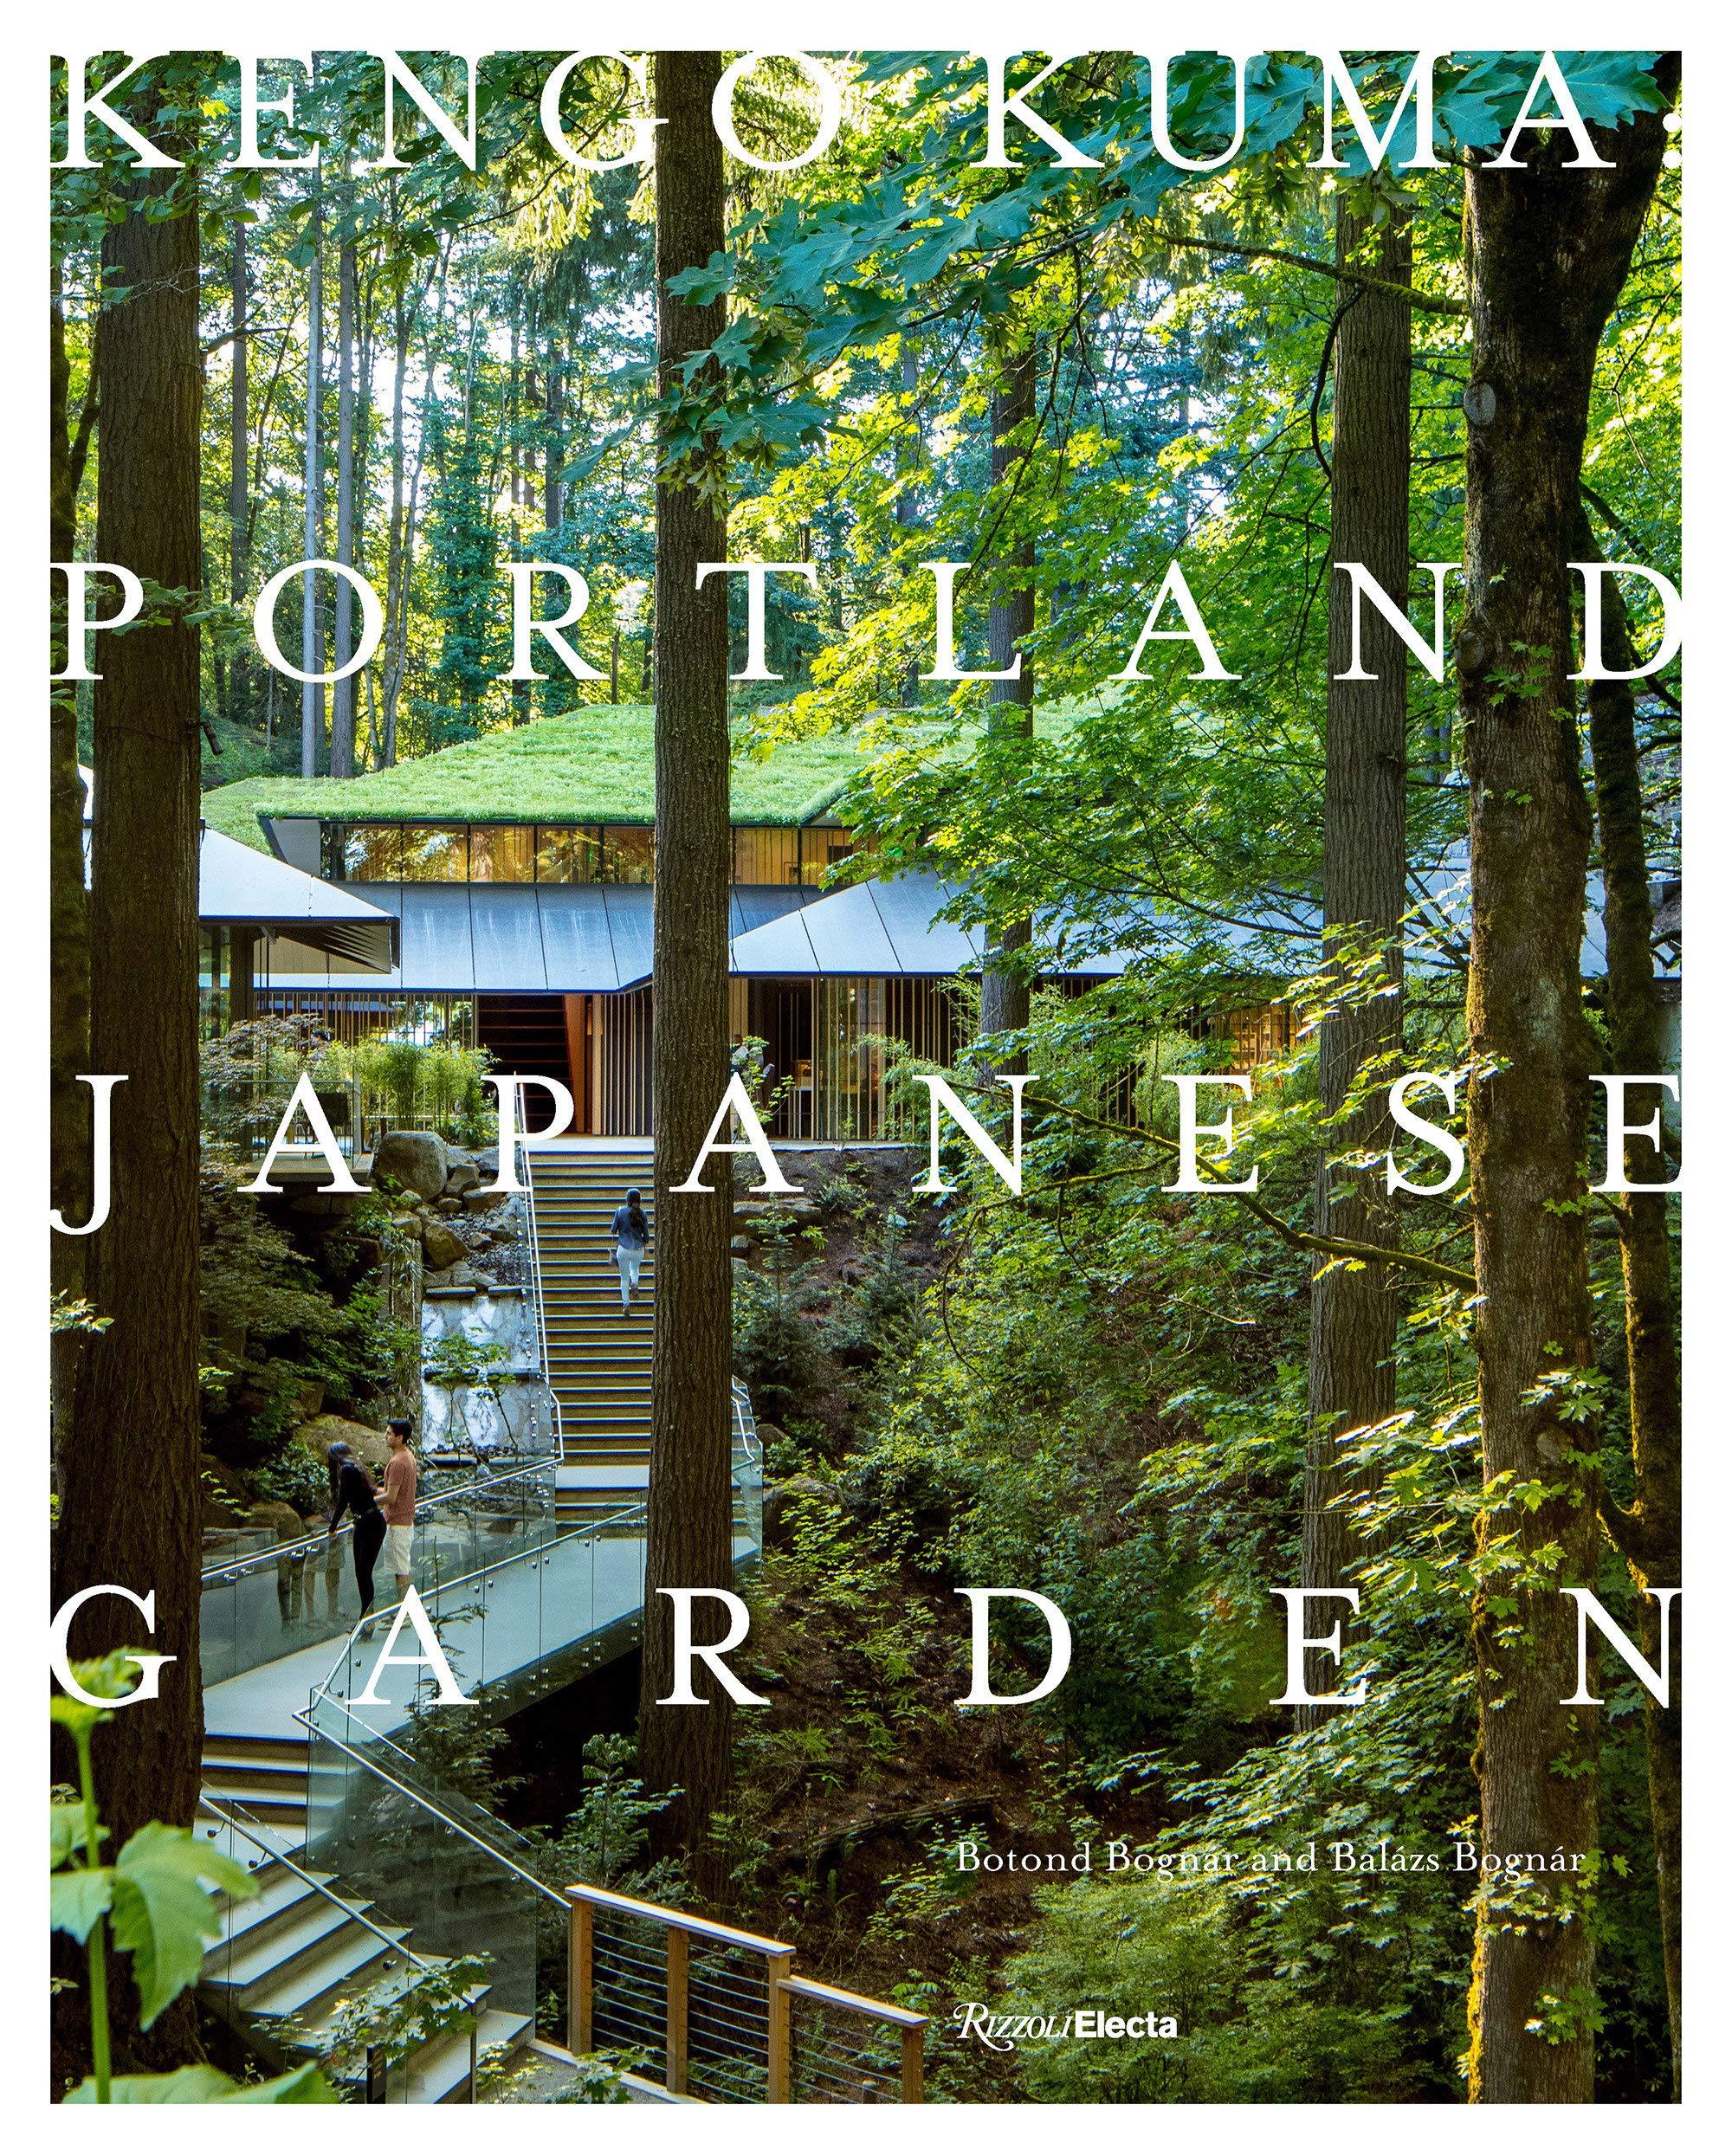 Kengo Kuma Portland Japanese Garden Bognar Botond Bognar Balazs Kuma Kengo 9780847864669 Amazon Com Books